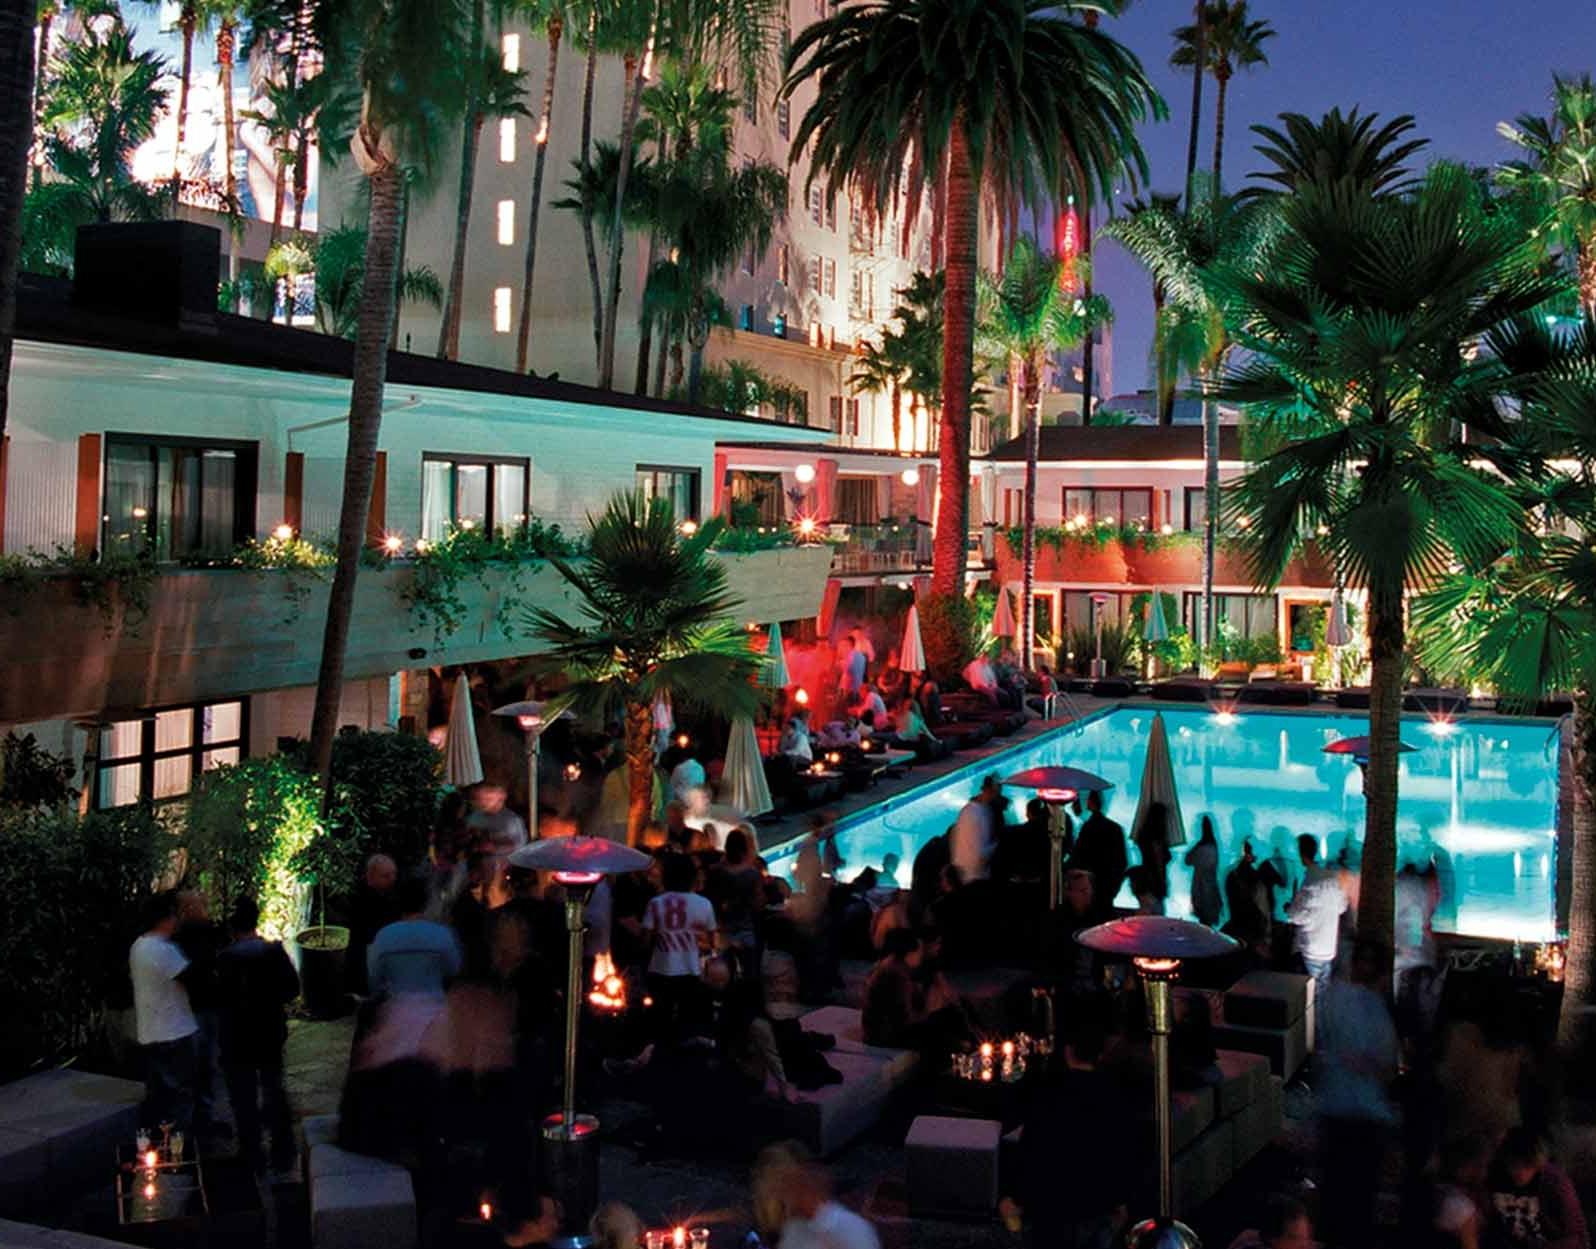 Library-Hollywood-Roosevelt-Hotel-NIght-pool-2.jpg